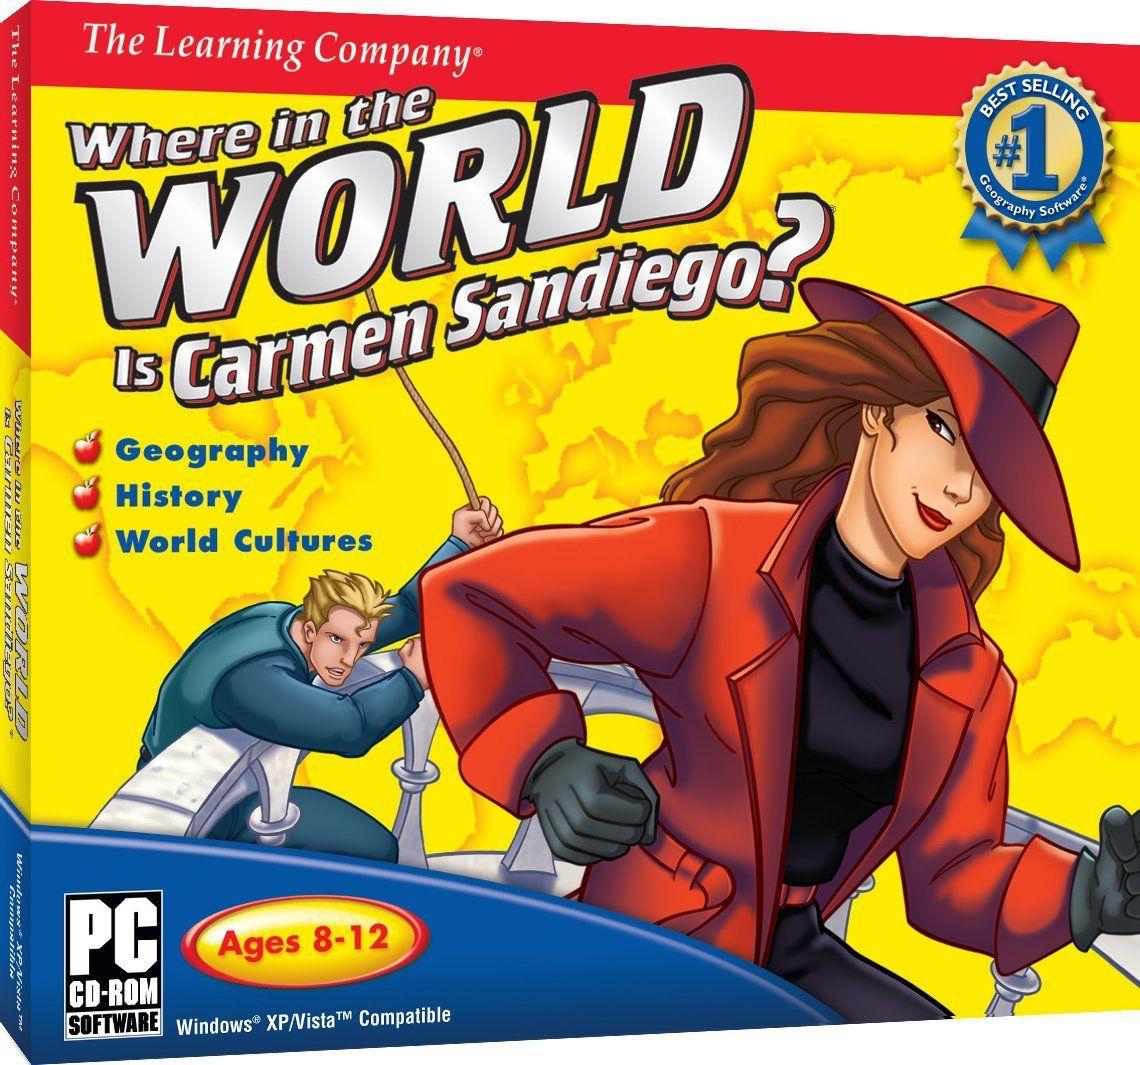 Carmen Sandiego In Computer Game Google Search Carmen Sandiego The Learning Company Carmen